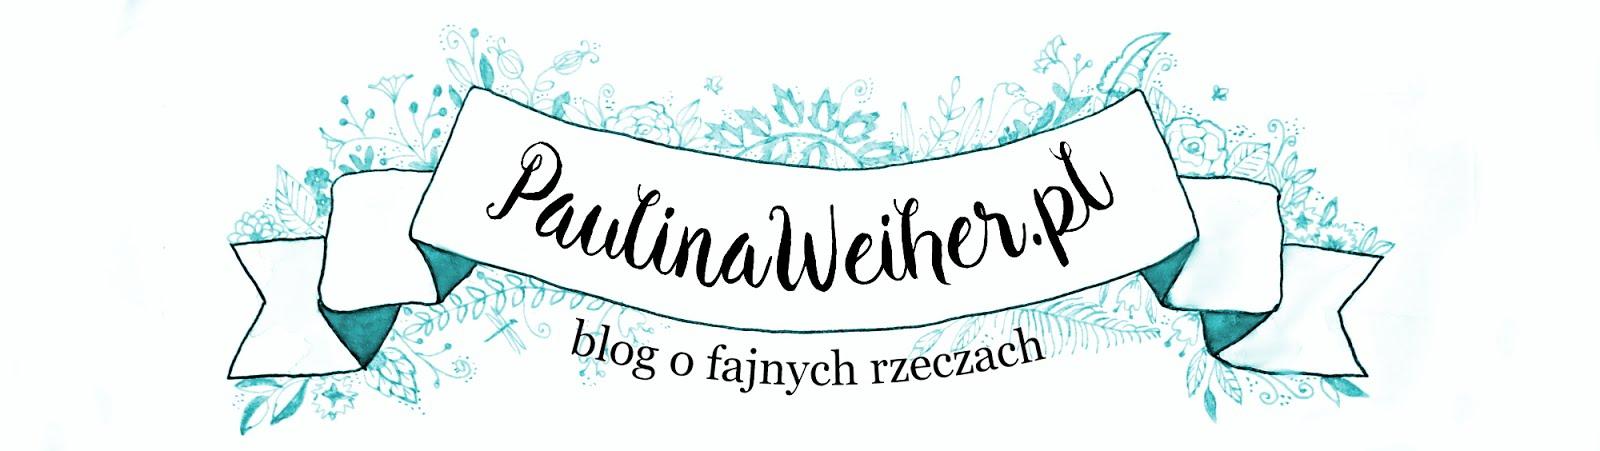 paulinaweiher.pl